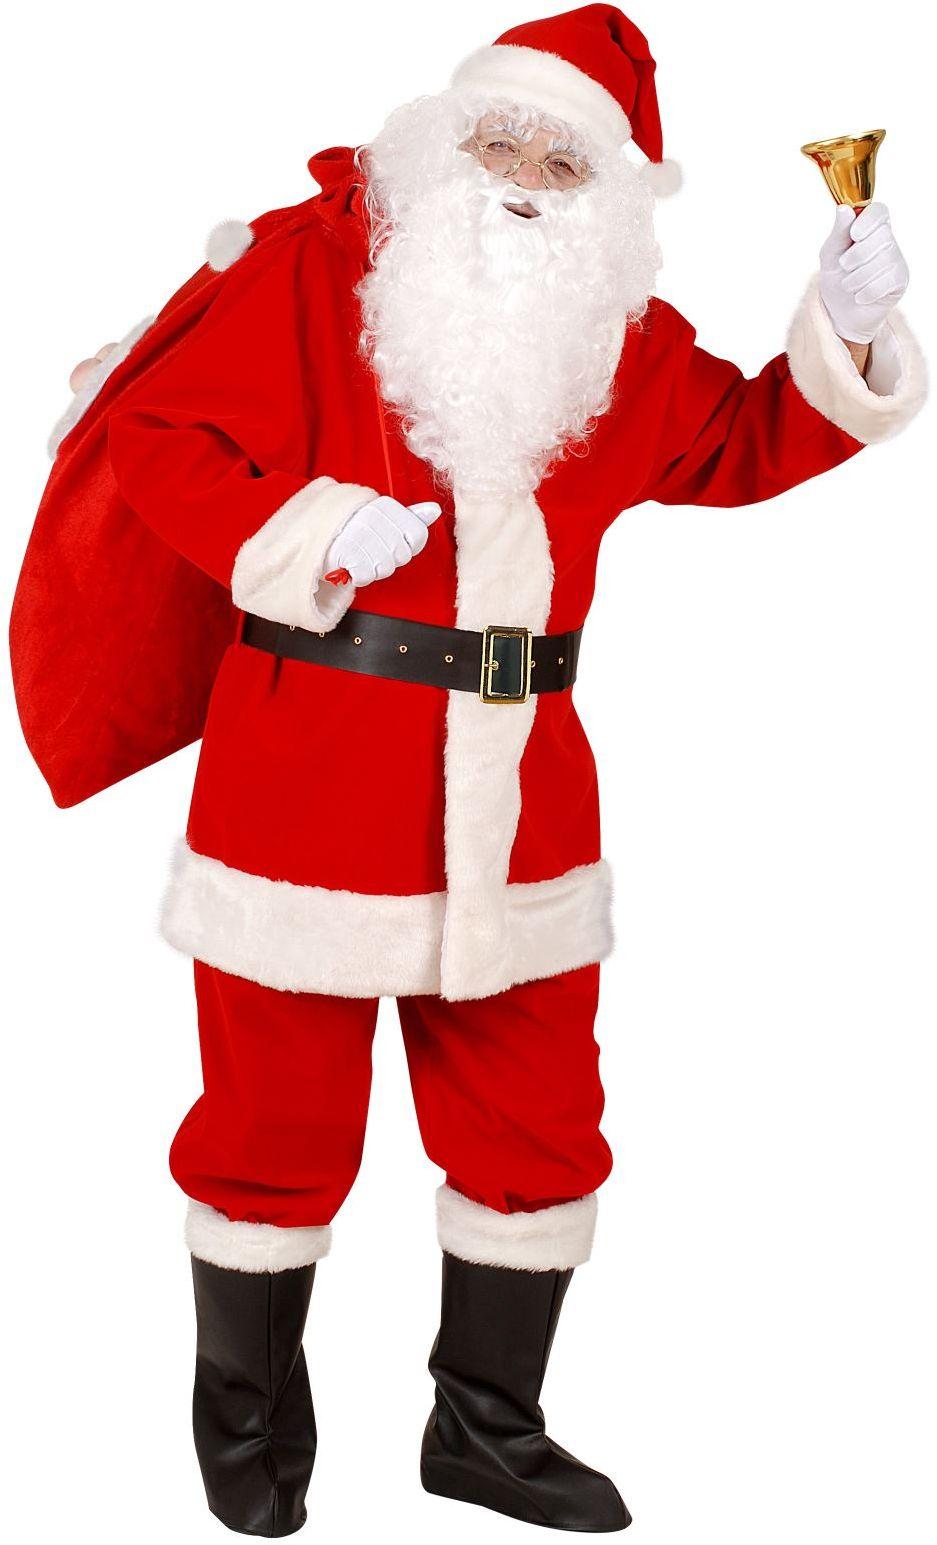 Professioneel kerstman kostuum